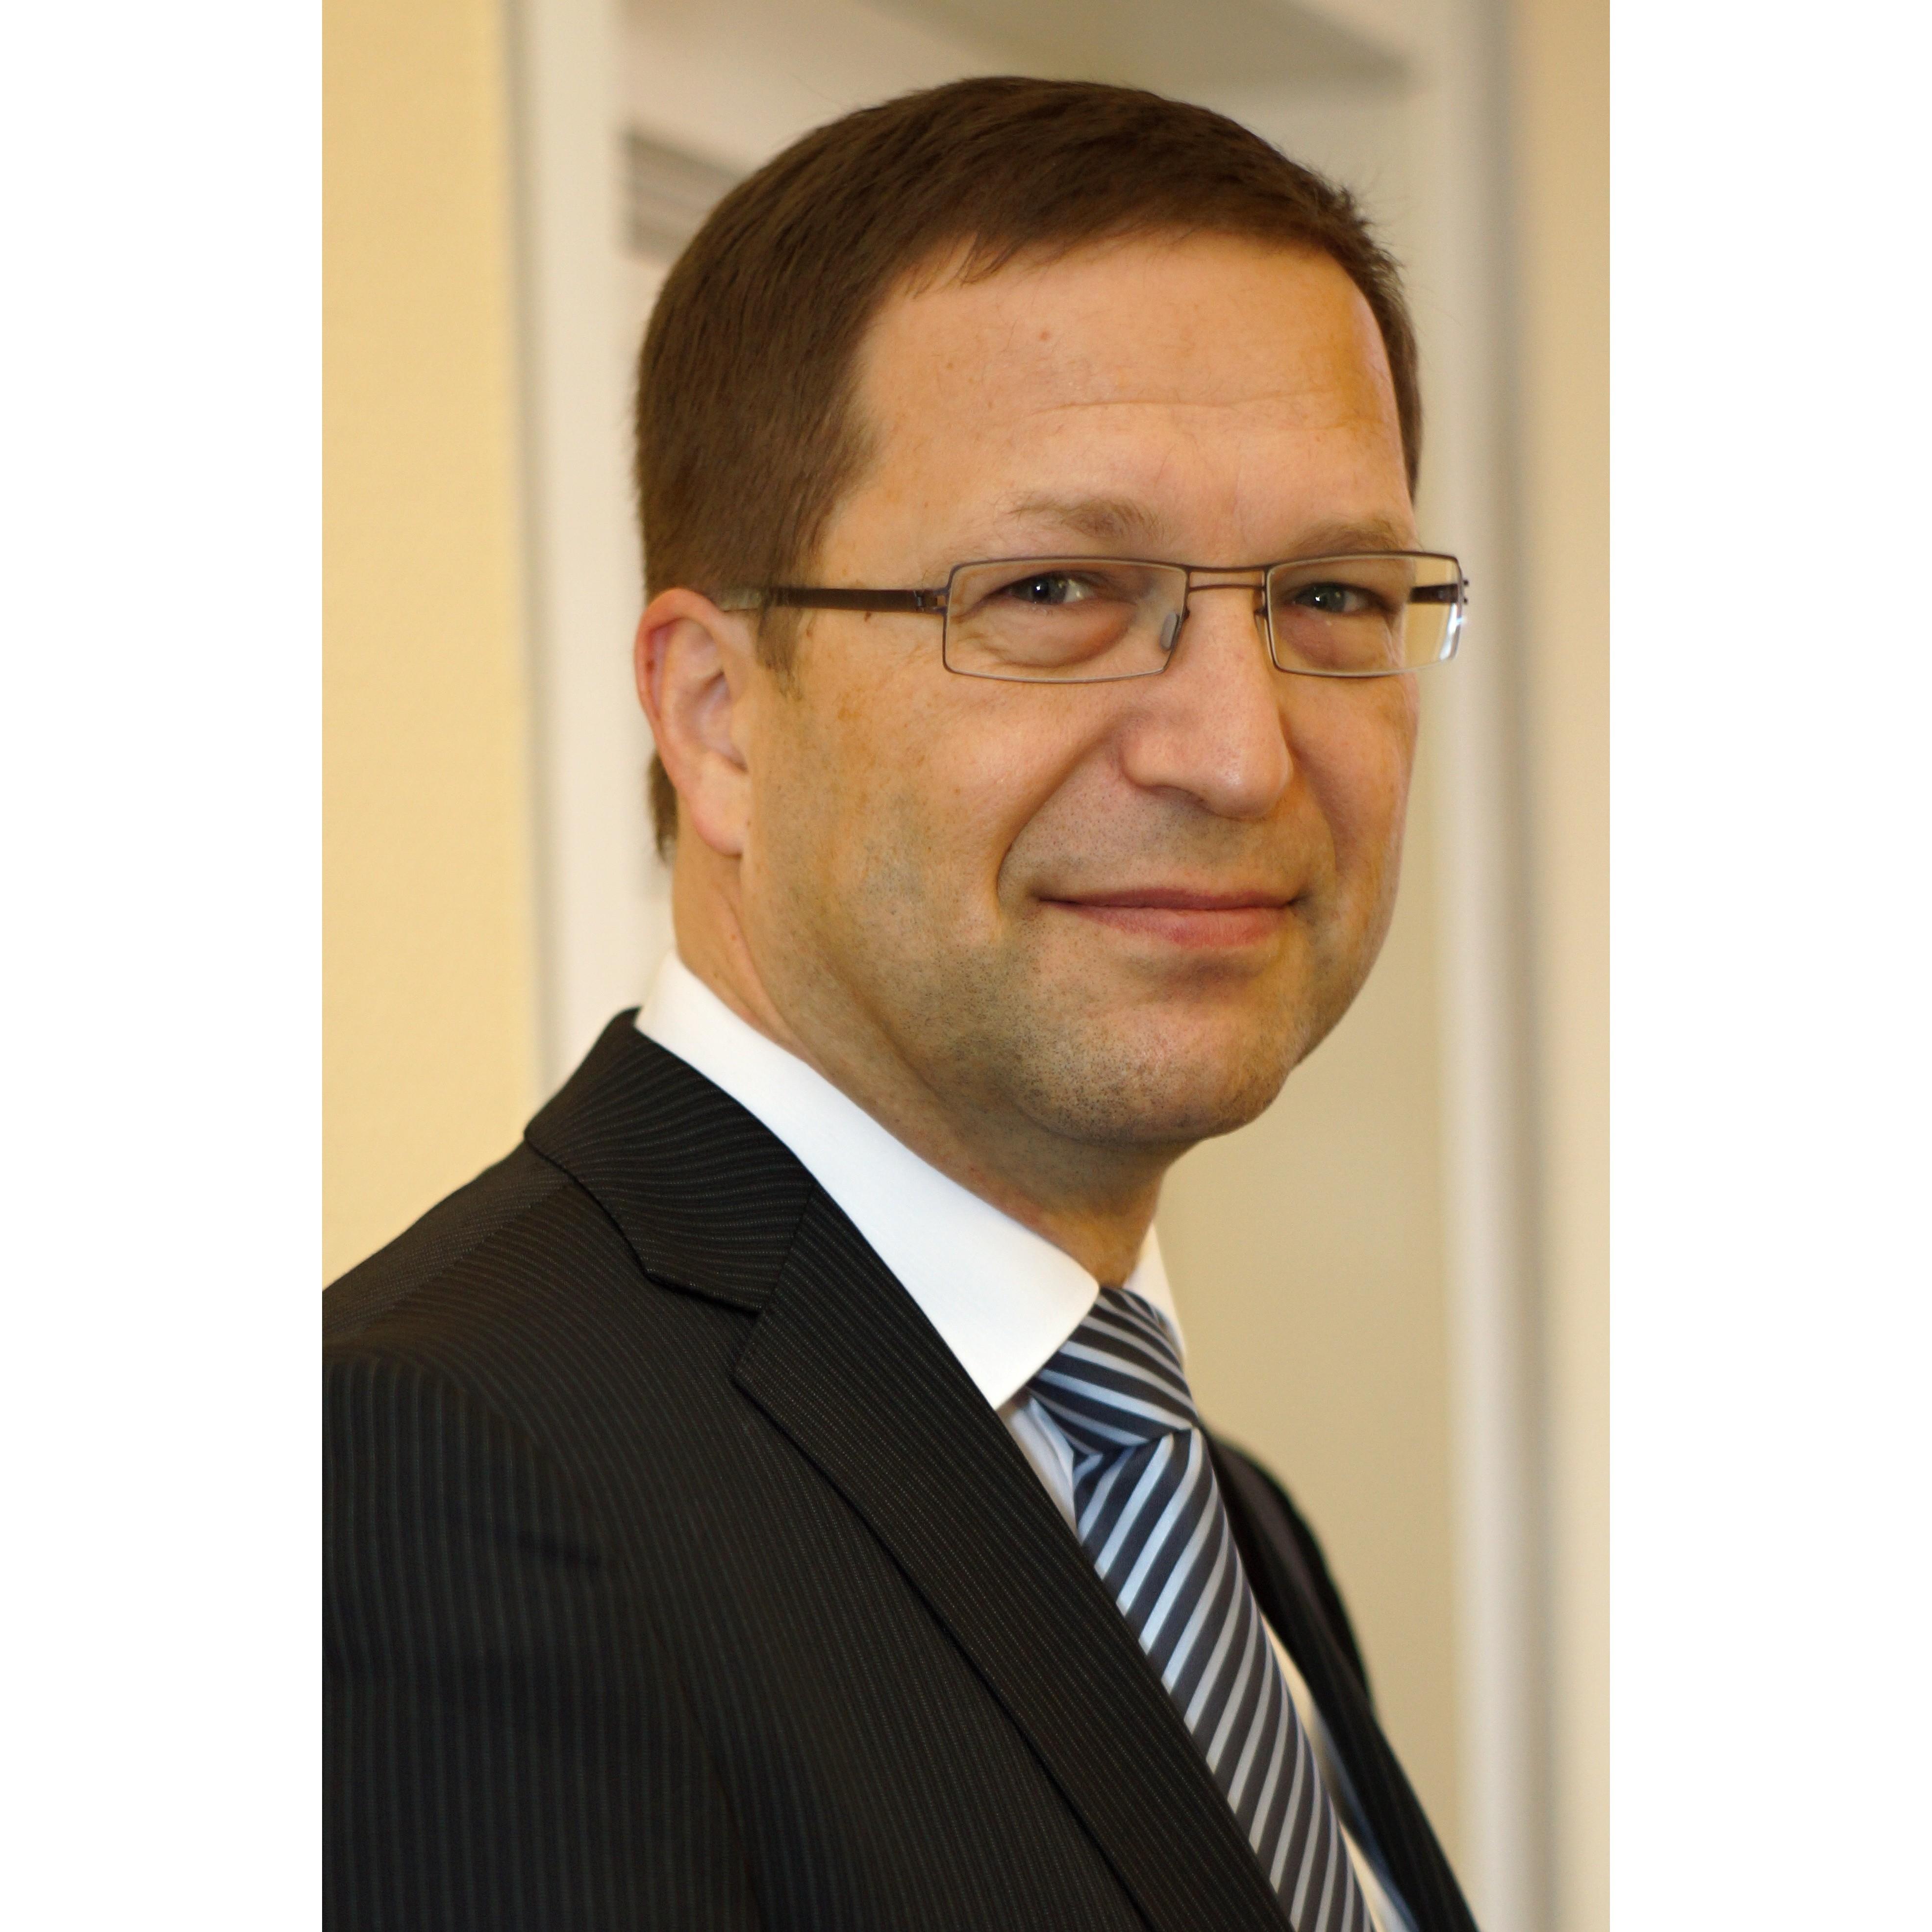 Rechtsanwaltskanzlei Peter Pascual